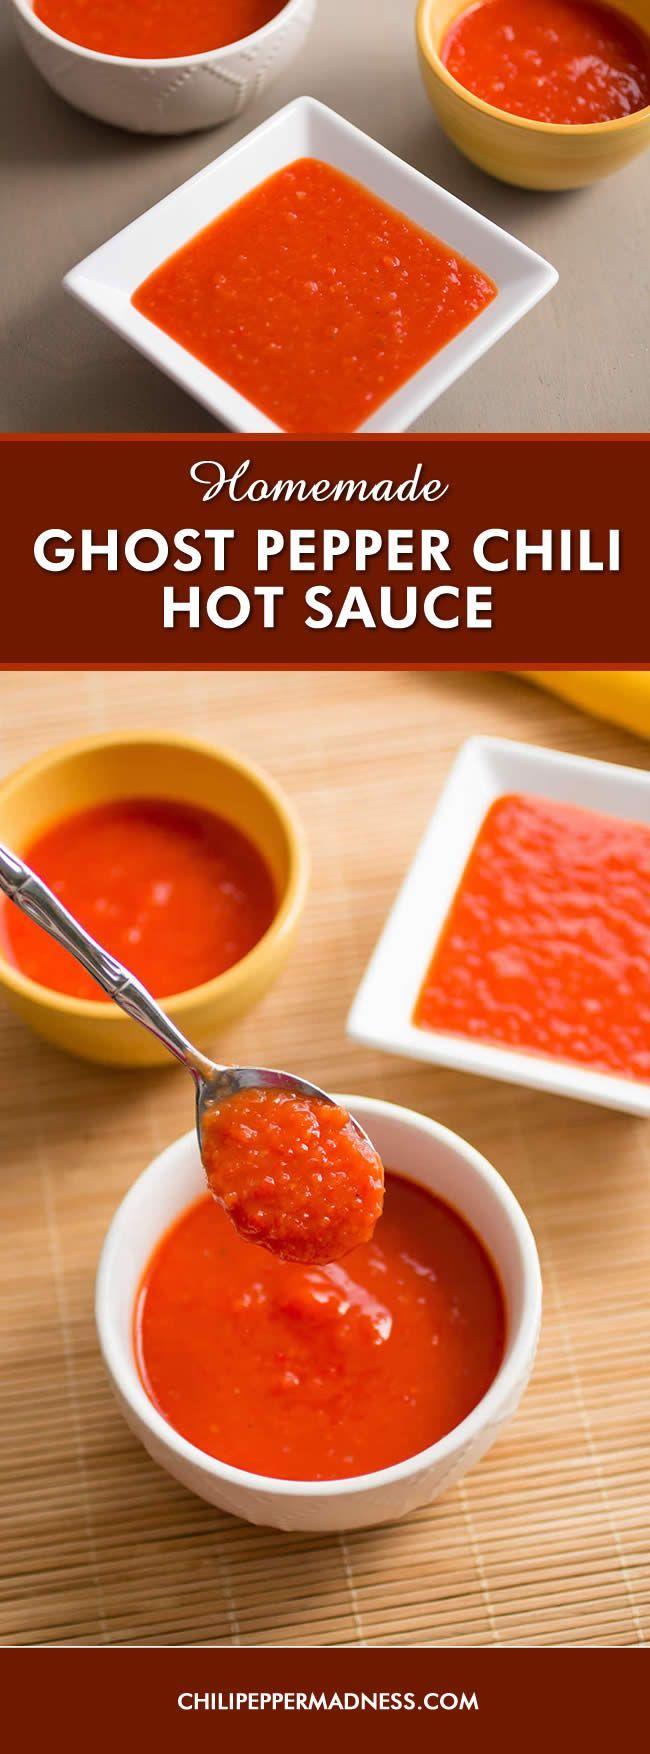 Homemade Ghost Pepper Chili Hot Sauce - Recipe